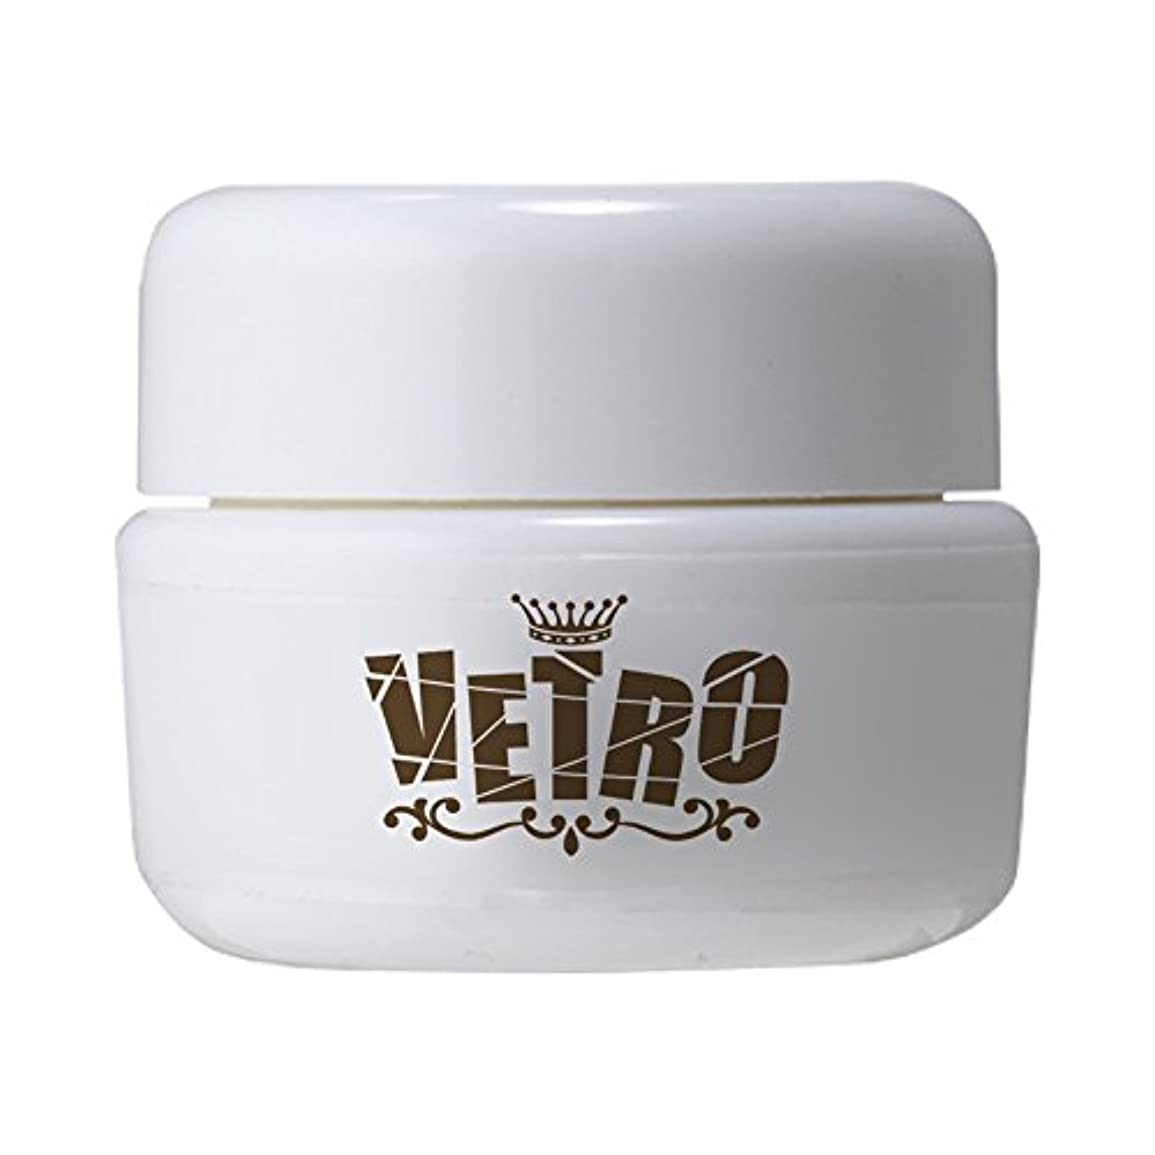 VETRO No.19 カラージェル マット VL055 ホワイト 4ml